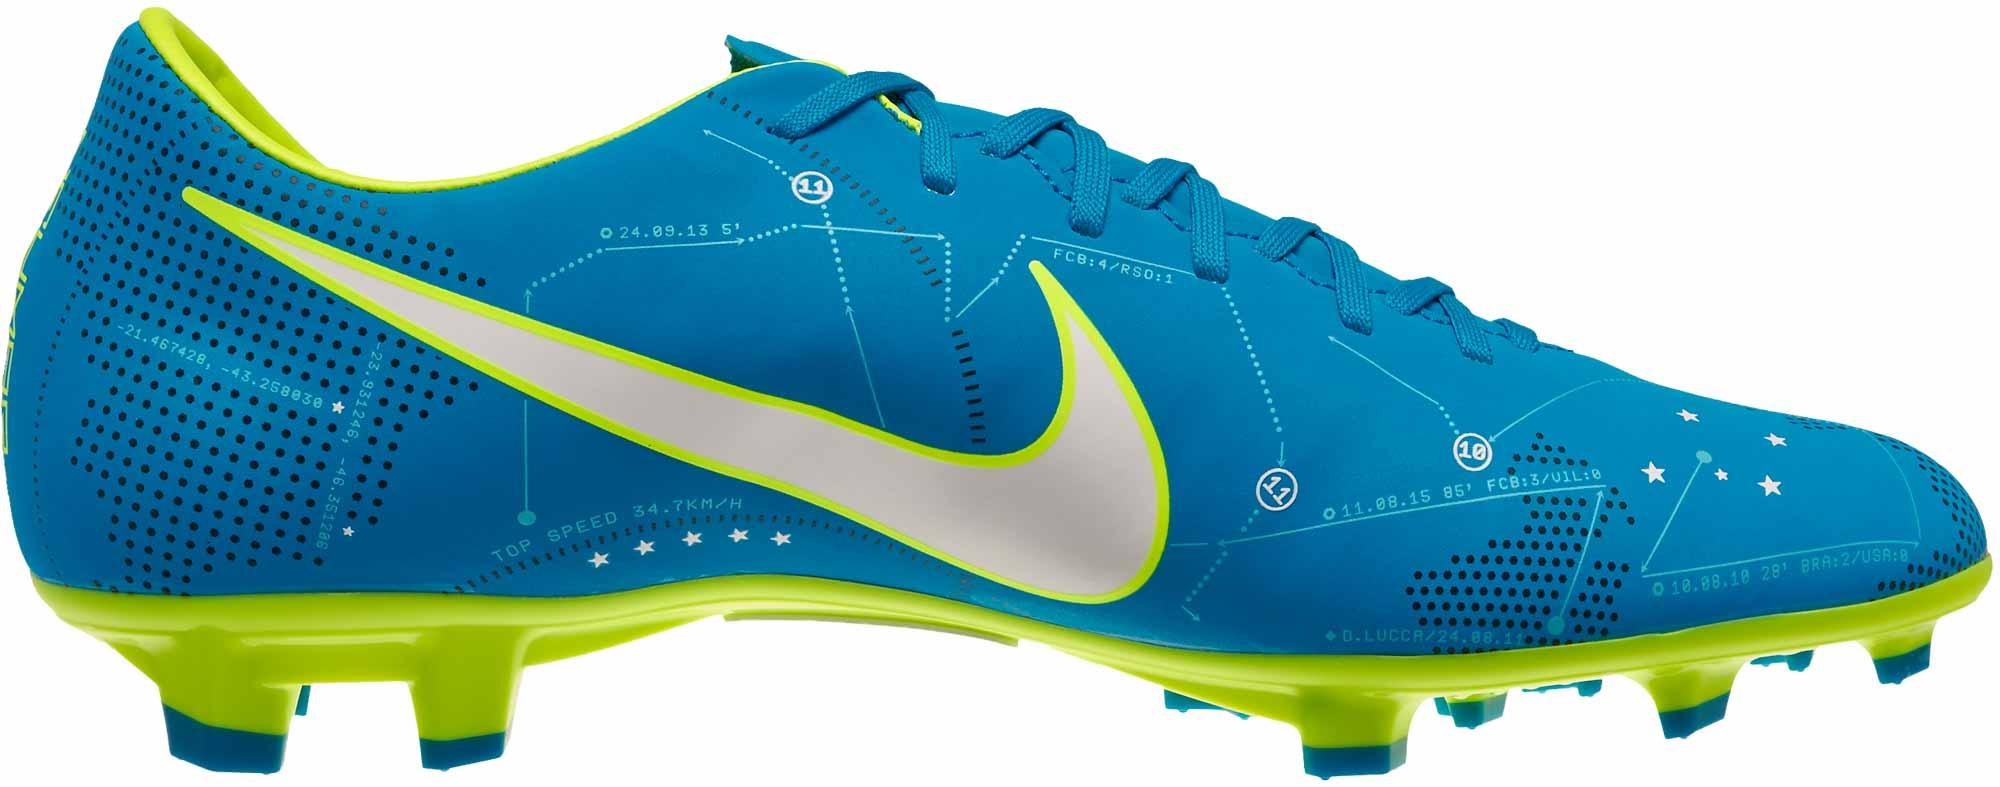 Nike Mercurial Victory 4 Cleats Green And Blue Jordan Future Laces ... 32b5e2d09e3